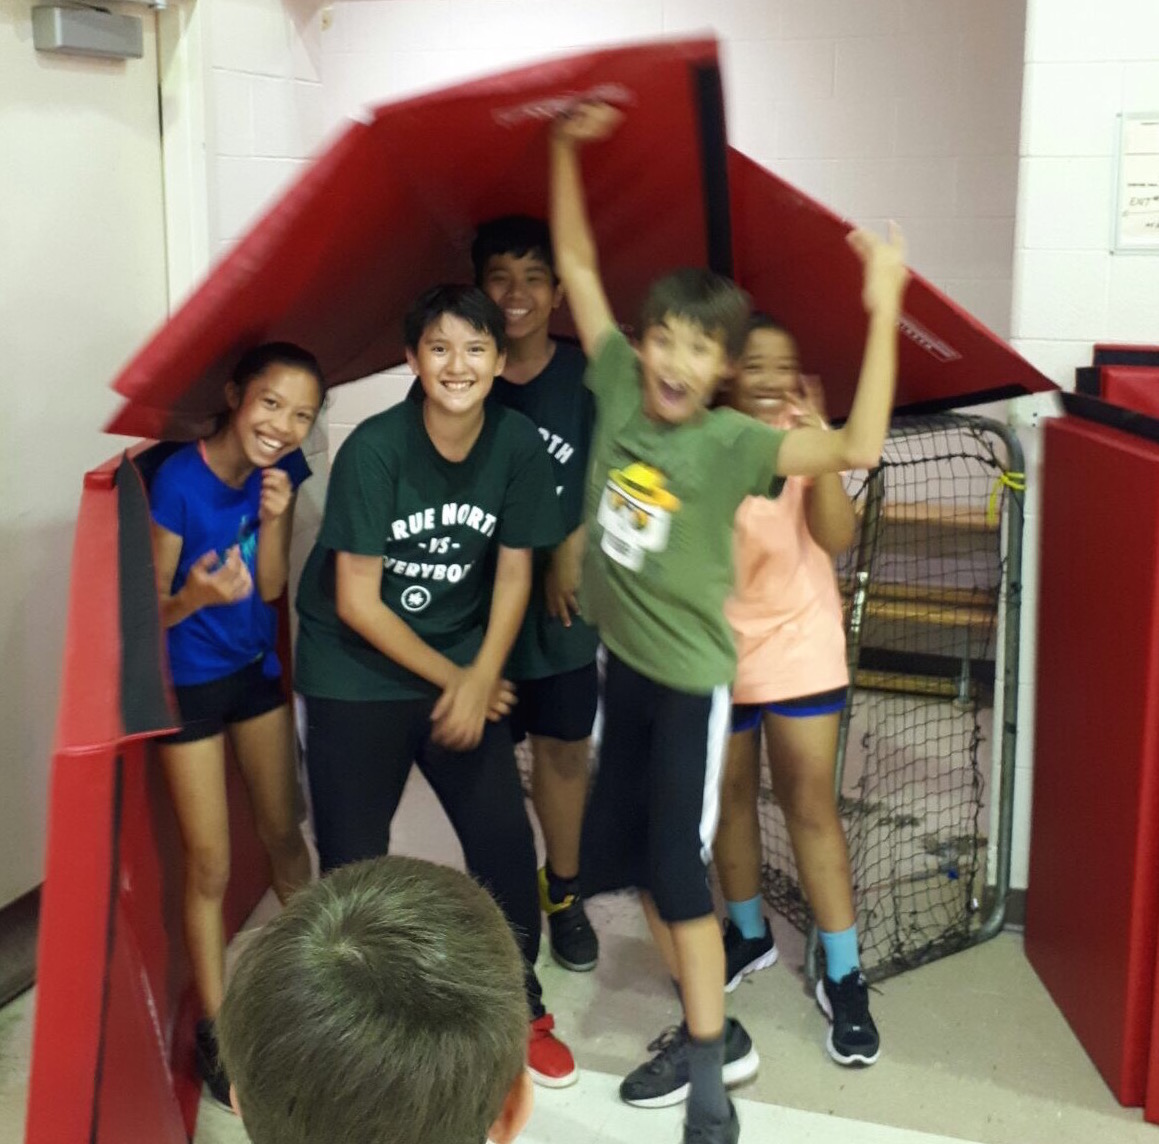 Kids having fun at our after school sports program in Toronto, Markham, Whitby, Etobicoke and Hamilton